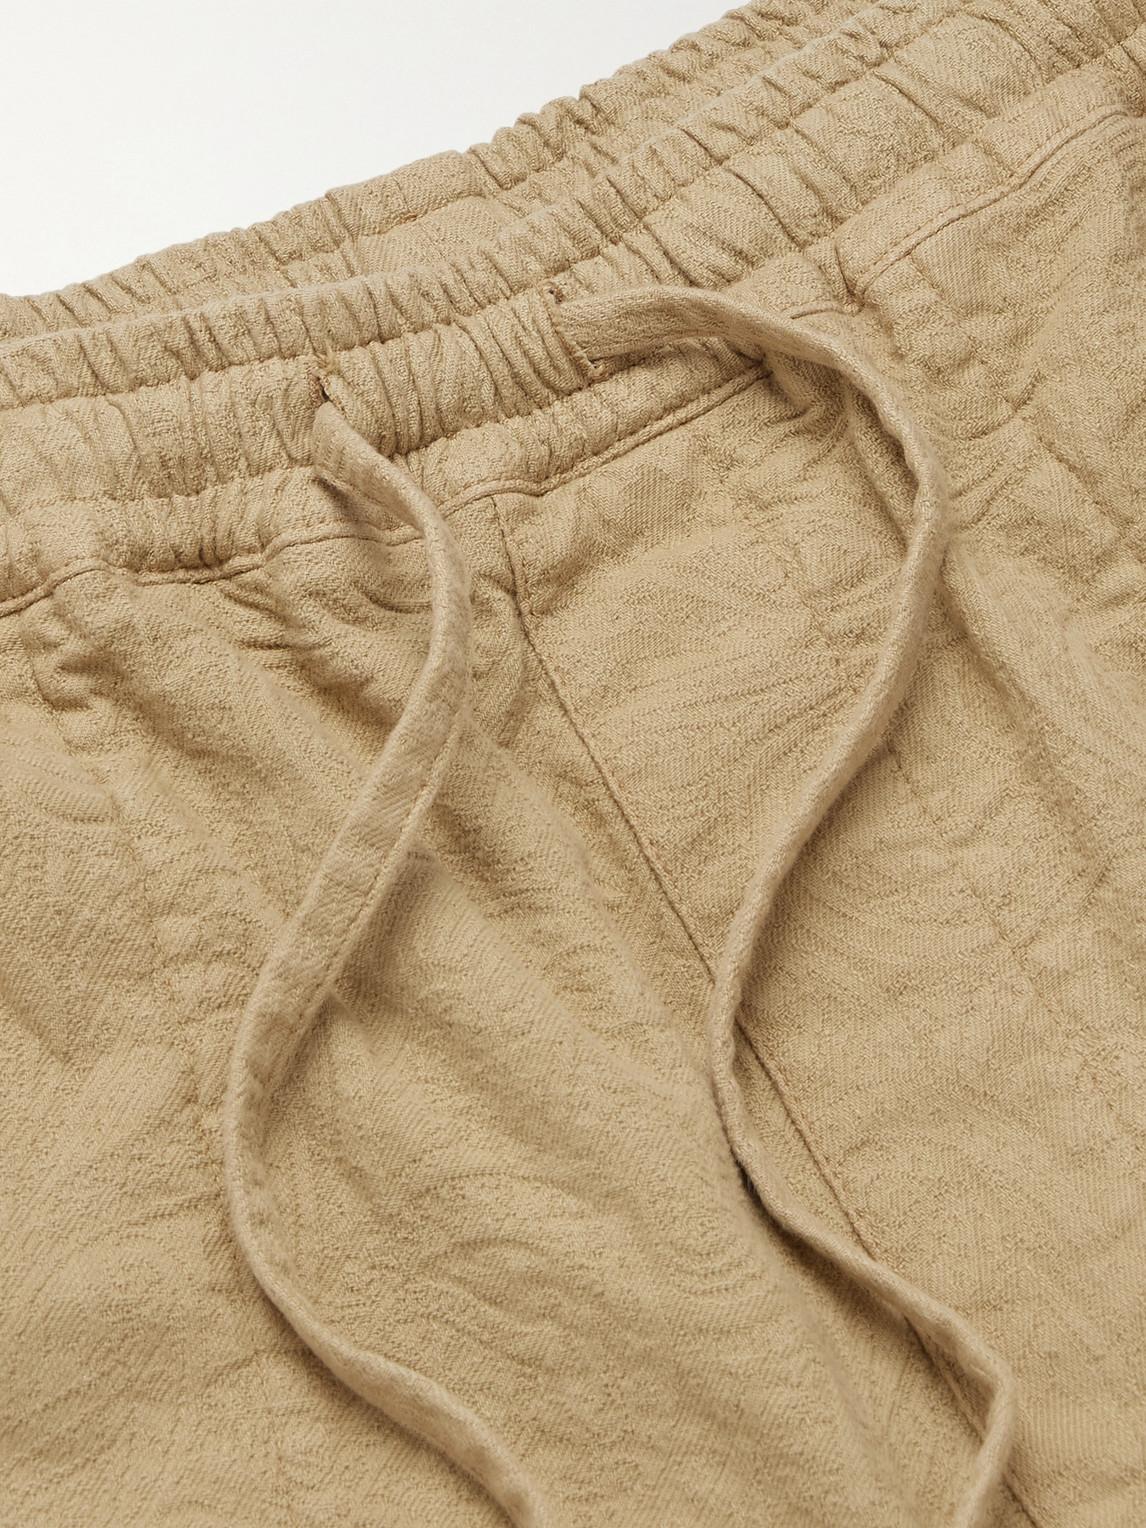 YMC YOU MUST CREATE Cottons Z GARMENT-DYED STRETCH-COTTON JACQUARD DRAWSTRING SHORTS